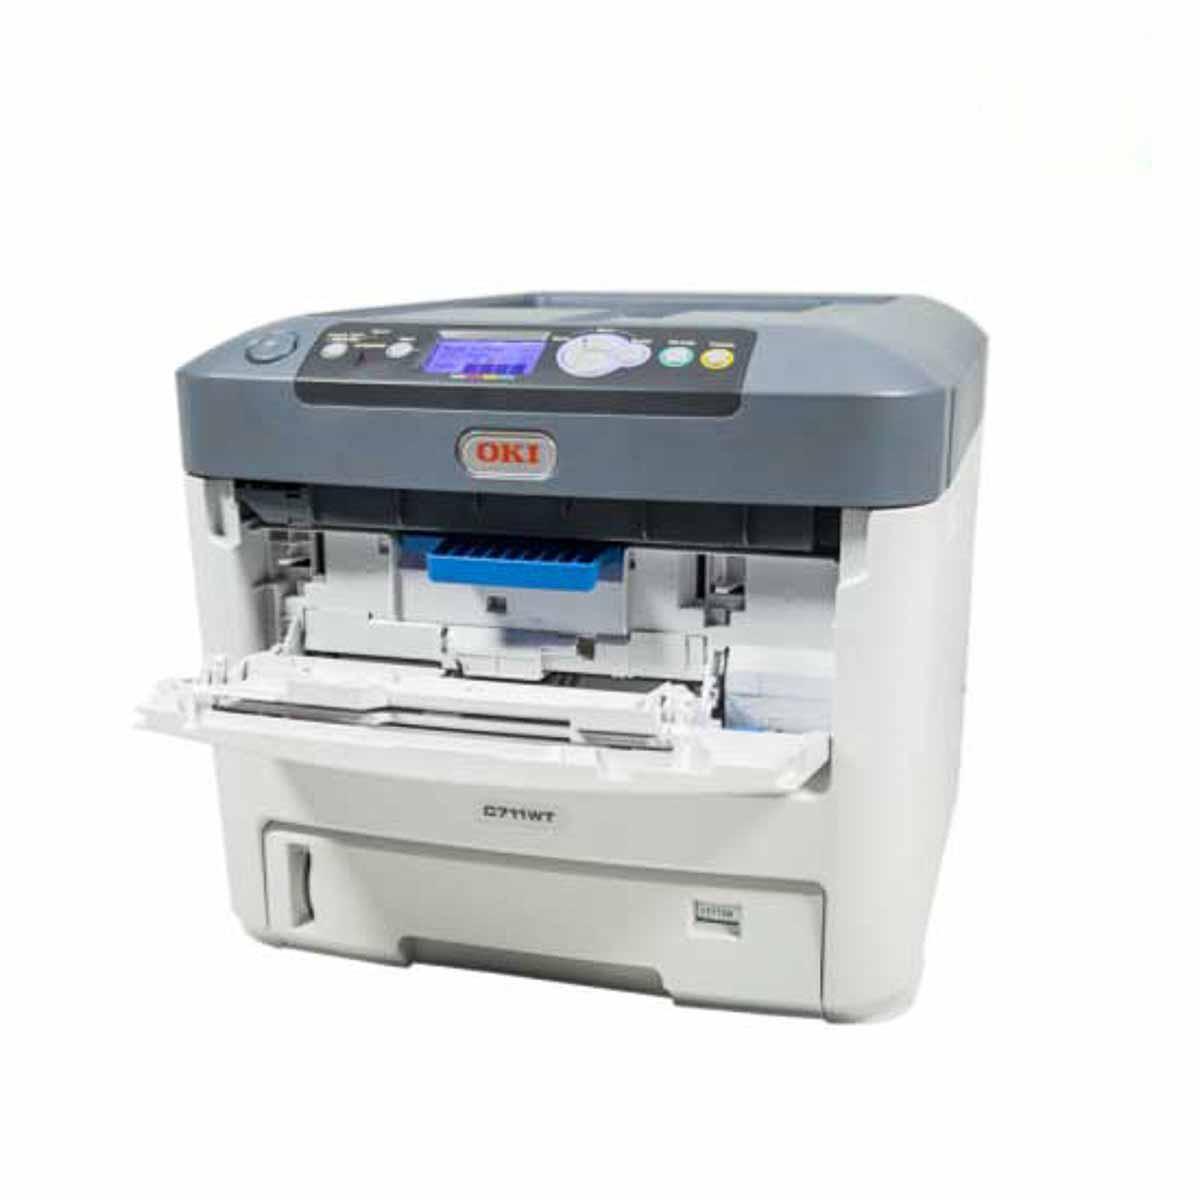 Impresora con toner blanco | Oki C711WT